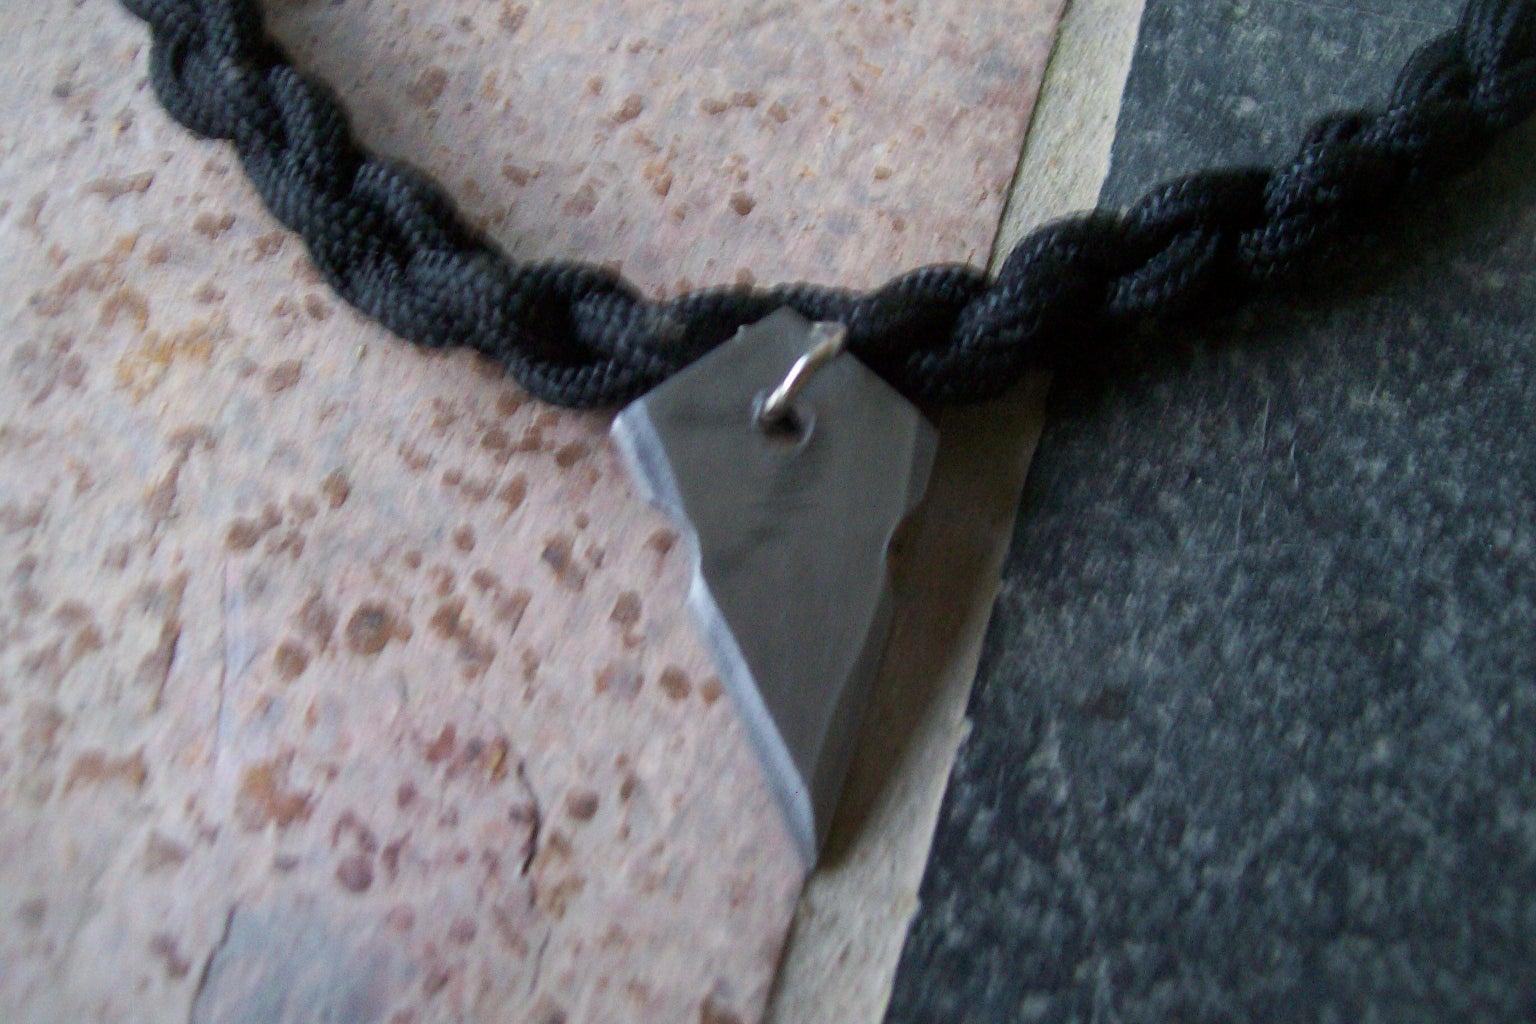 Attach to Keychain/ Necklace